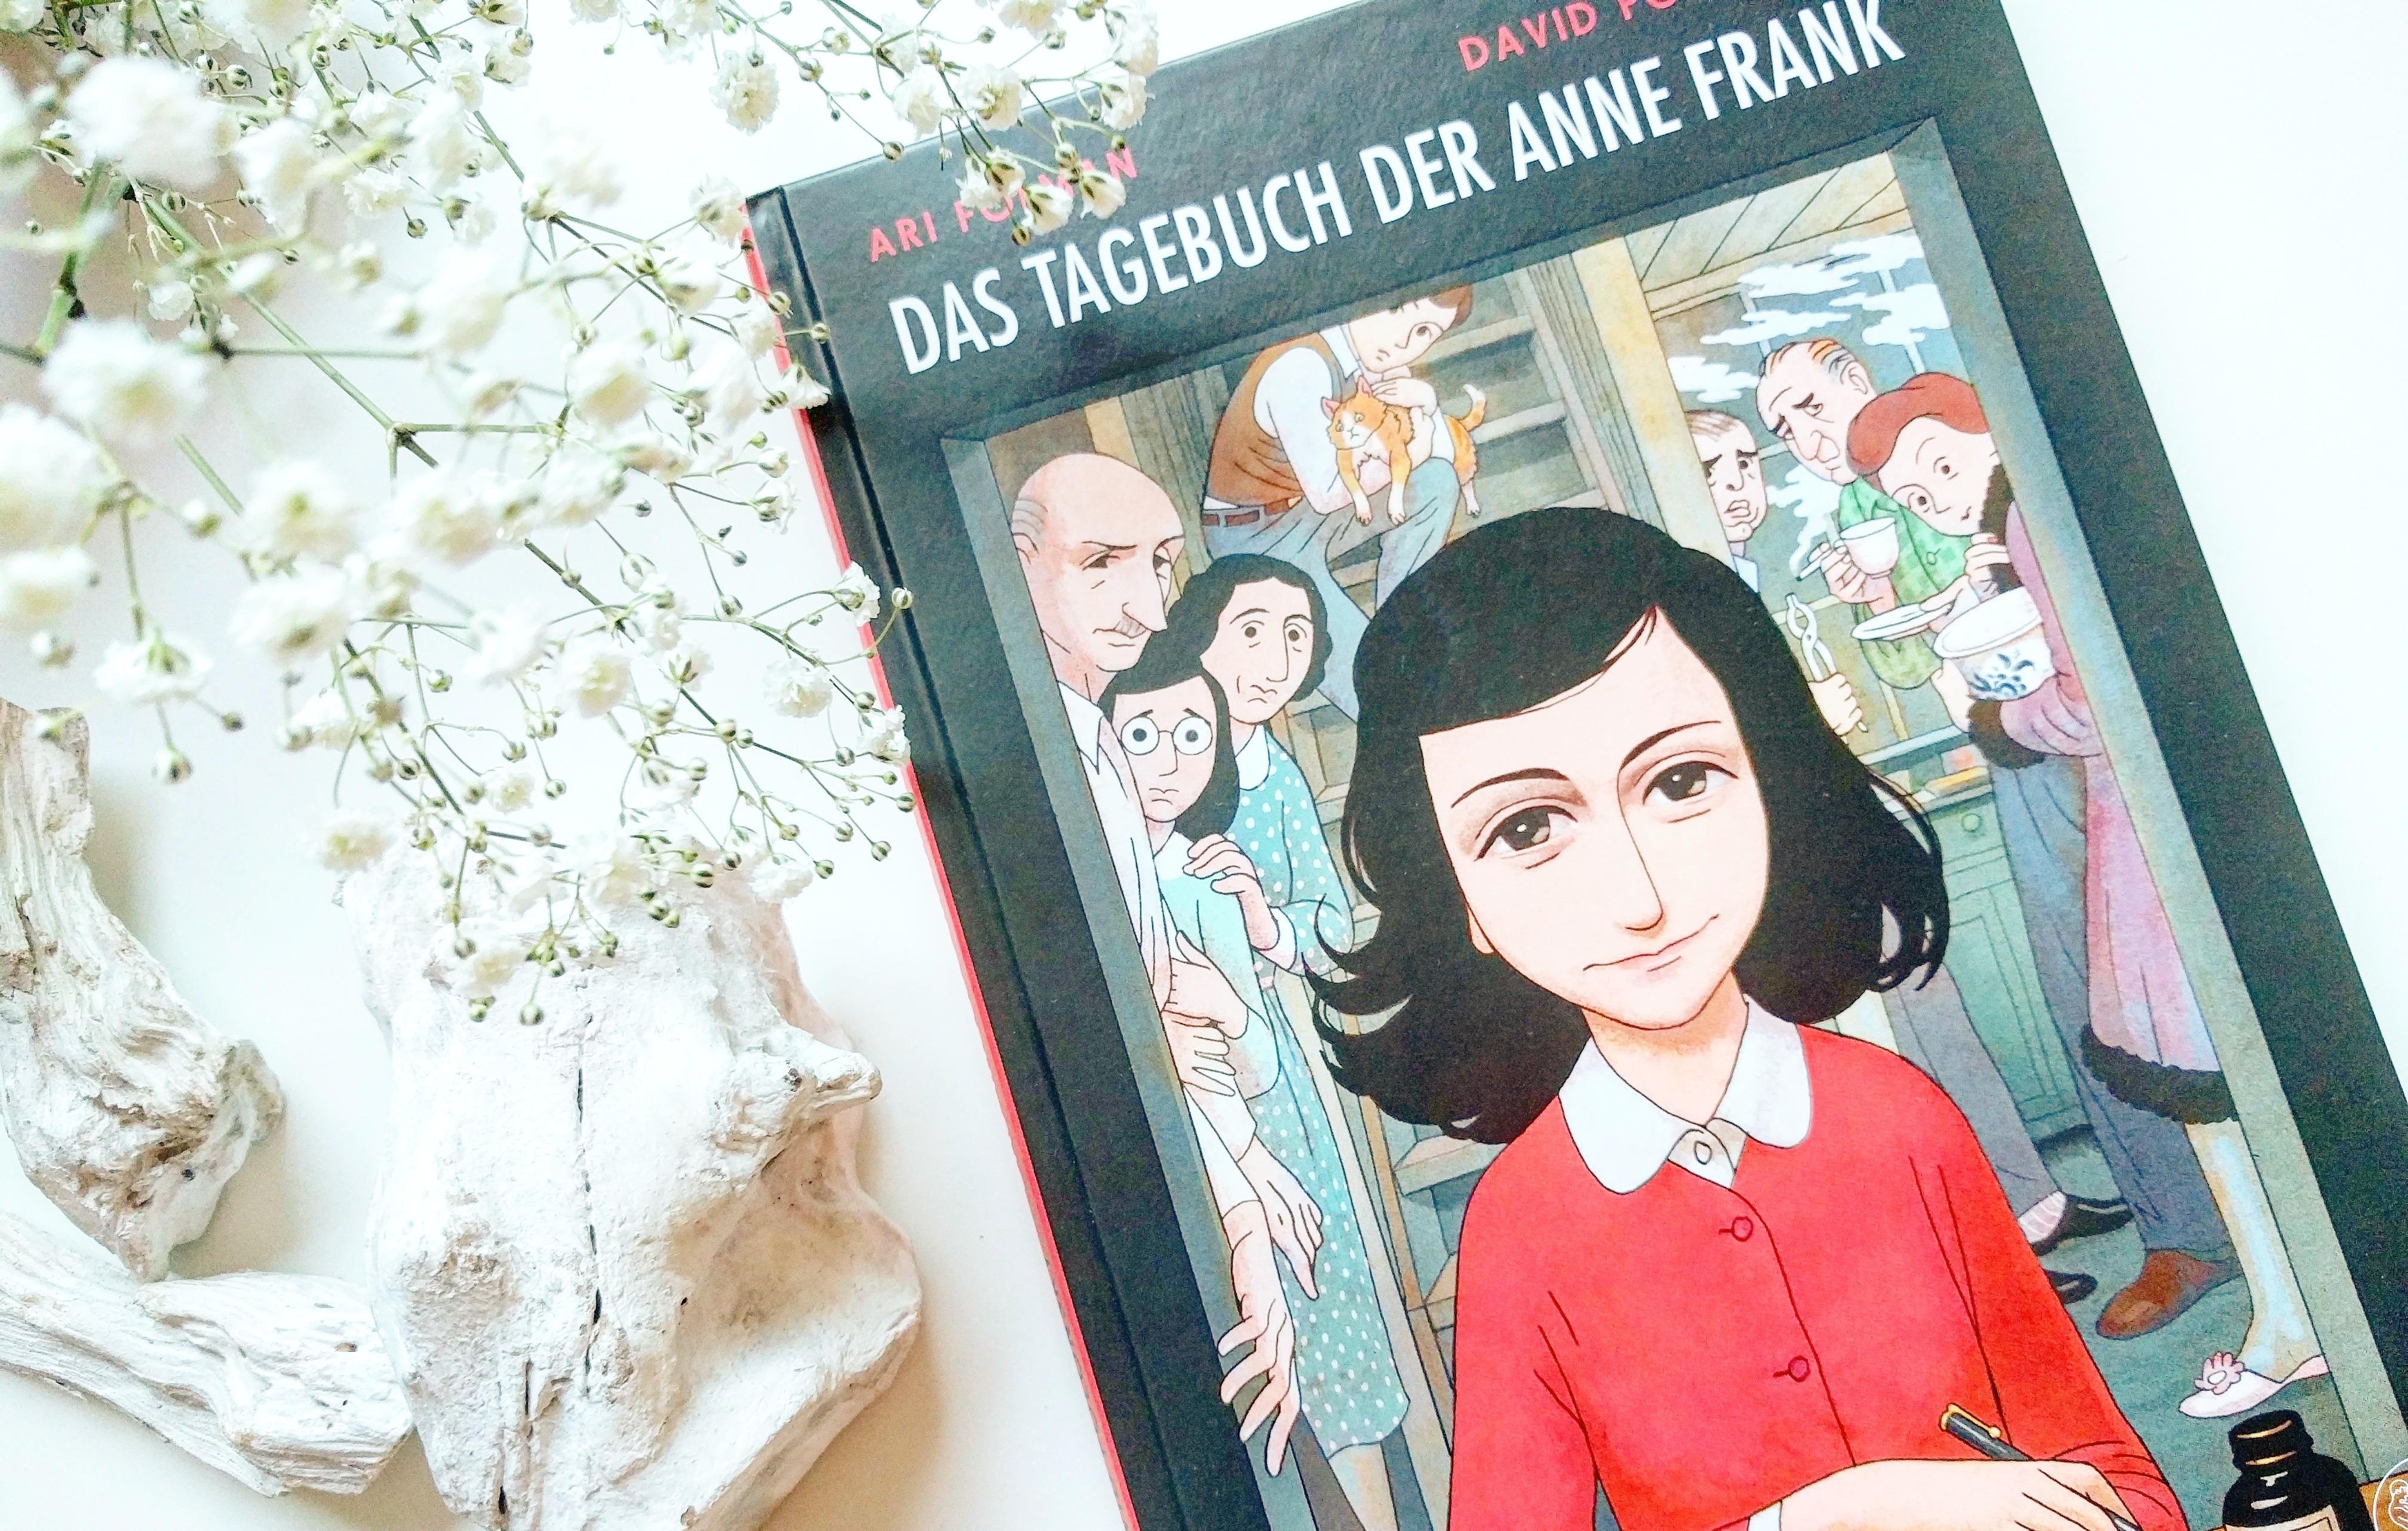 Das Tagebuch Der Anne Frank Von Ari Folman David Polonsky Pan